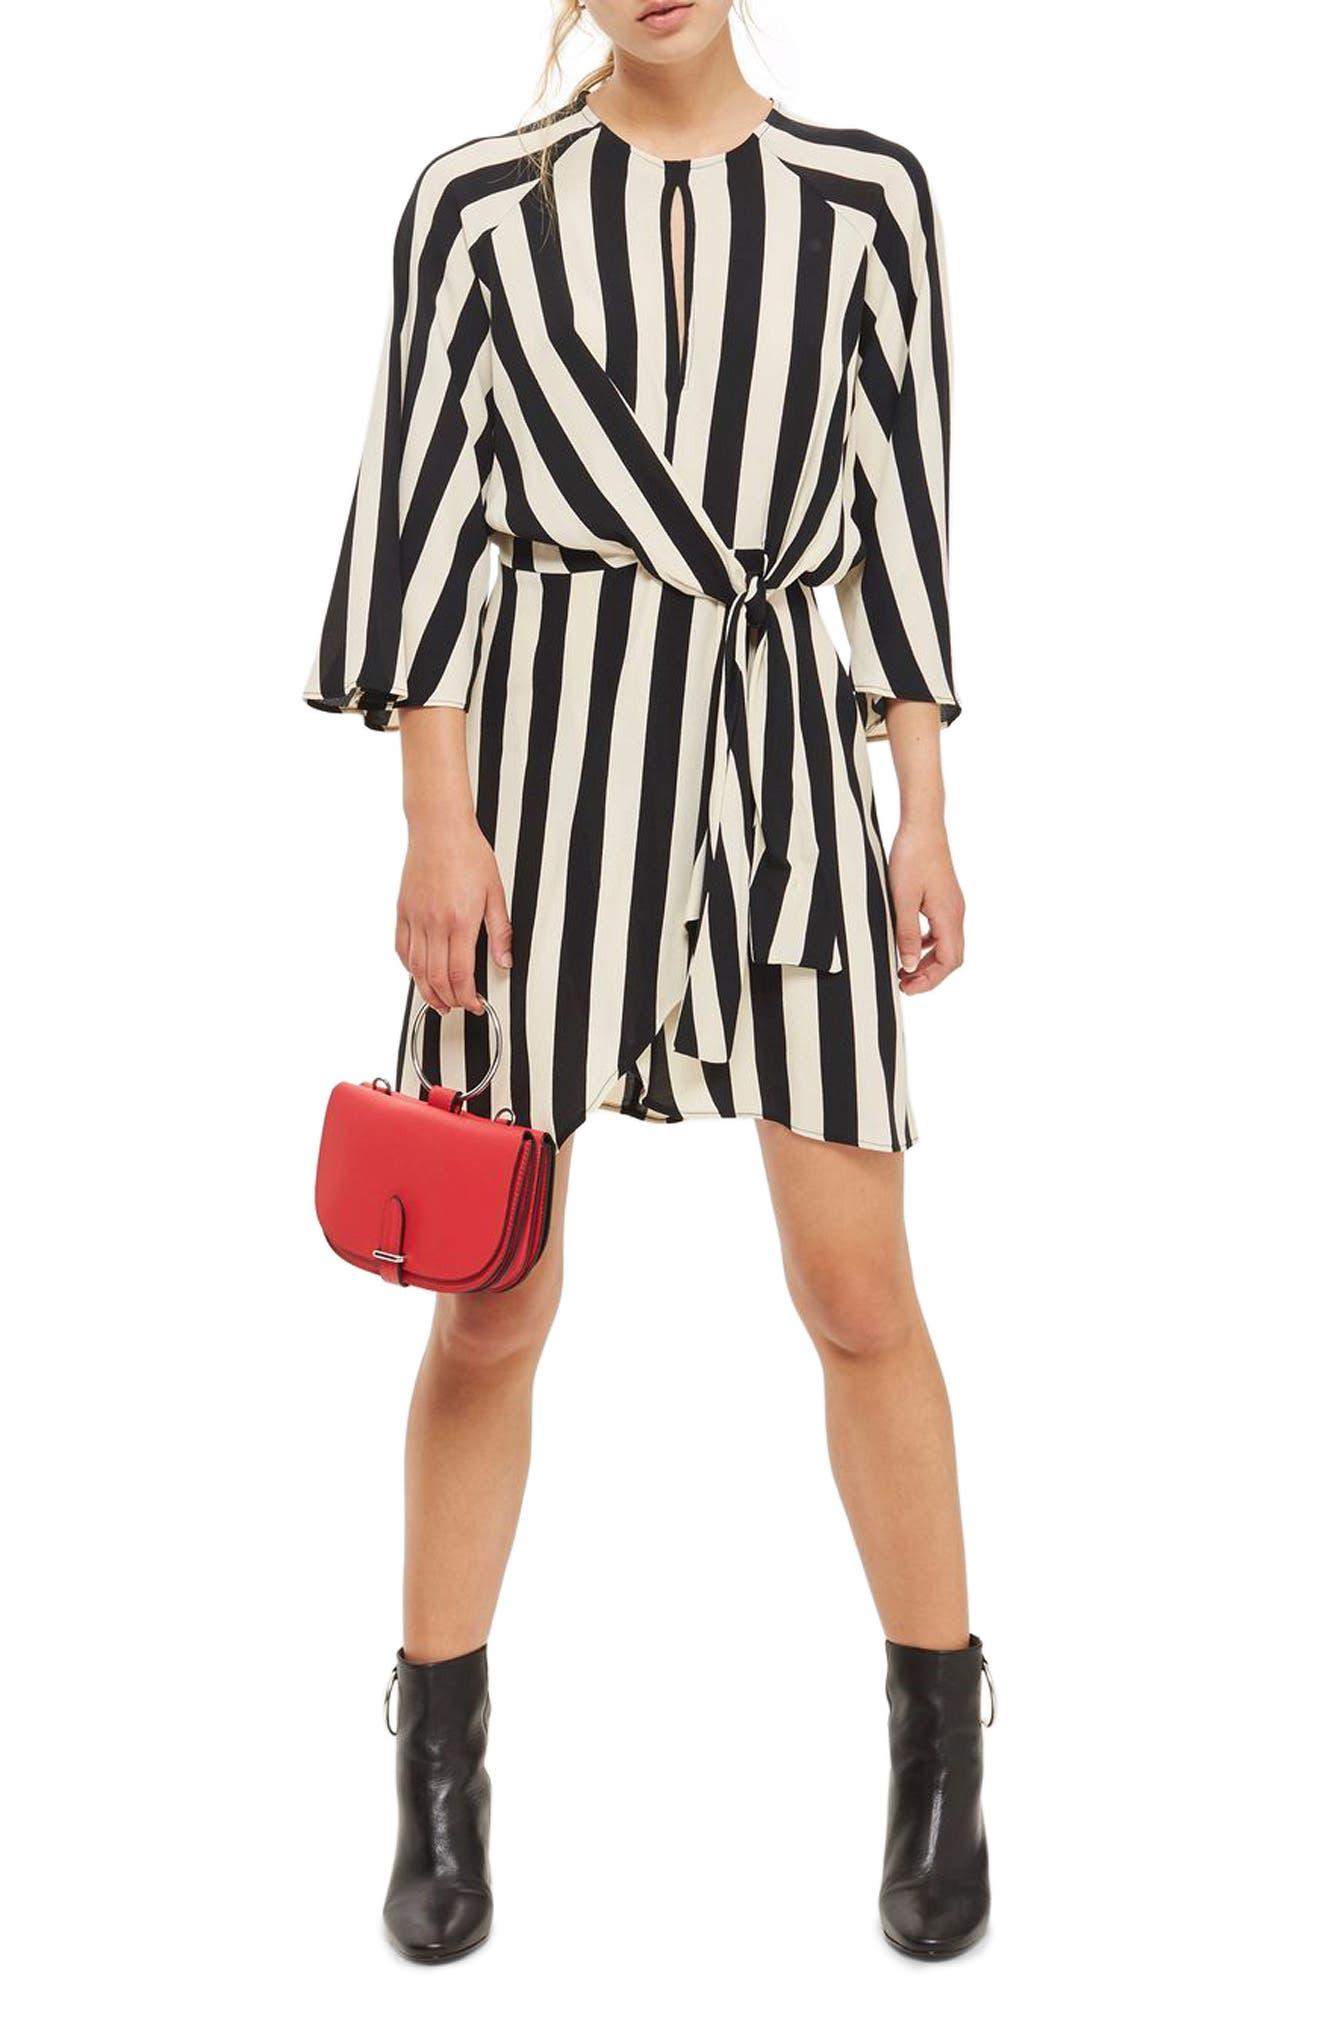 Topshop Humbug Stripe Knot Dress